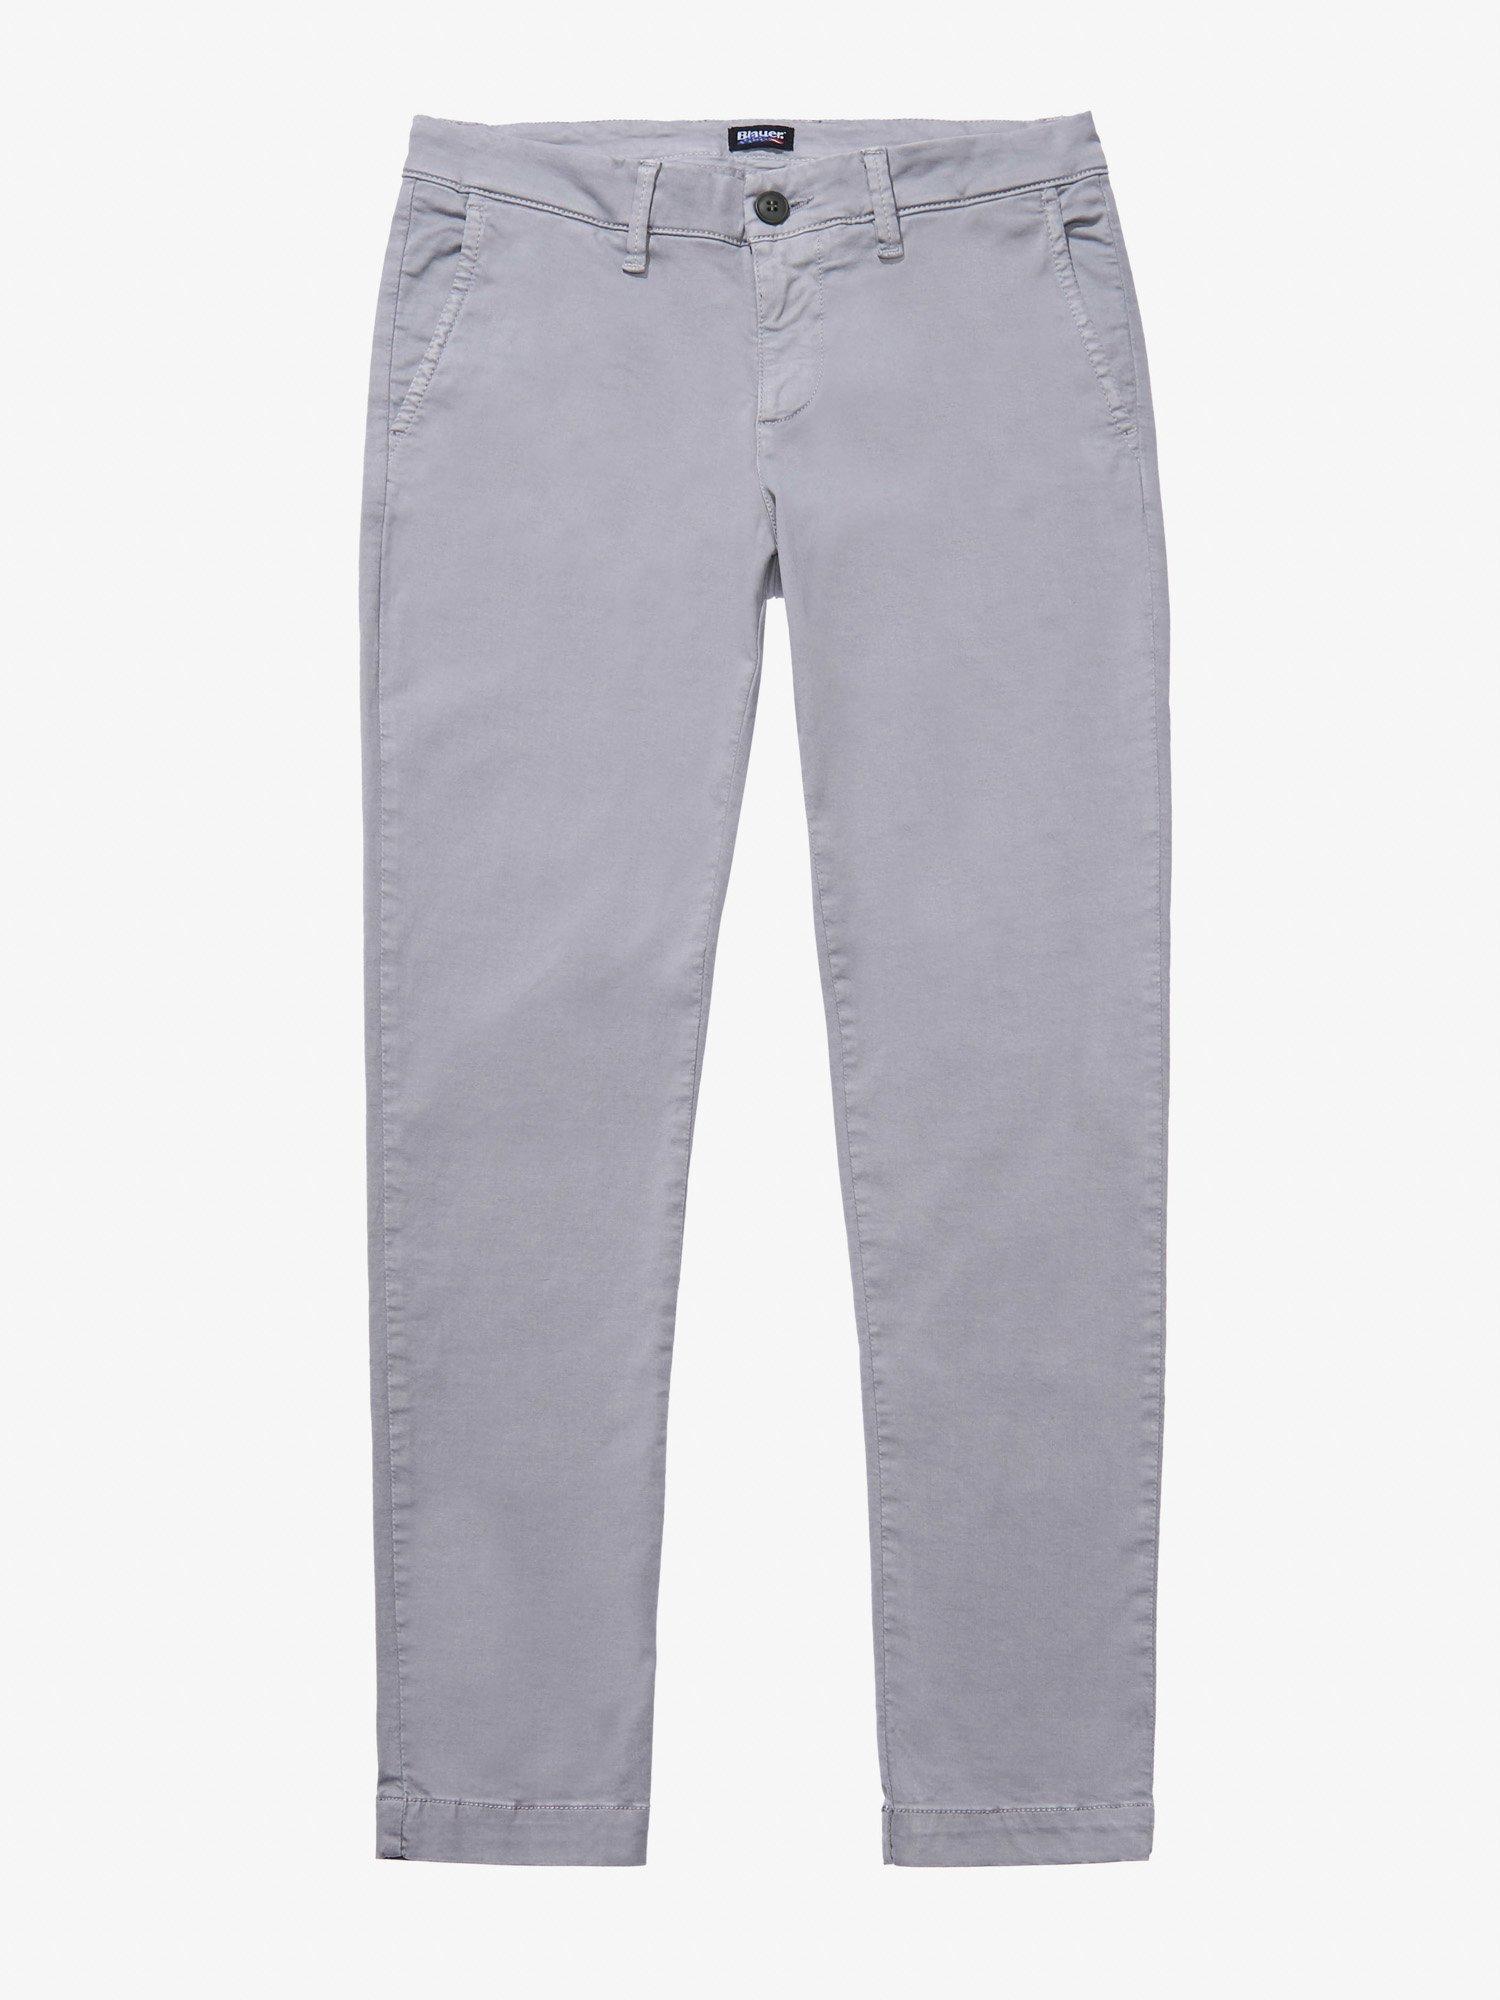 Blauer - SATIN STRETCH PANTS - Cloudy Grey - Blauer